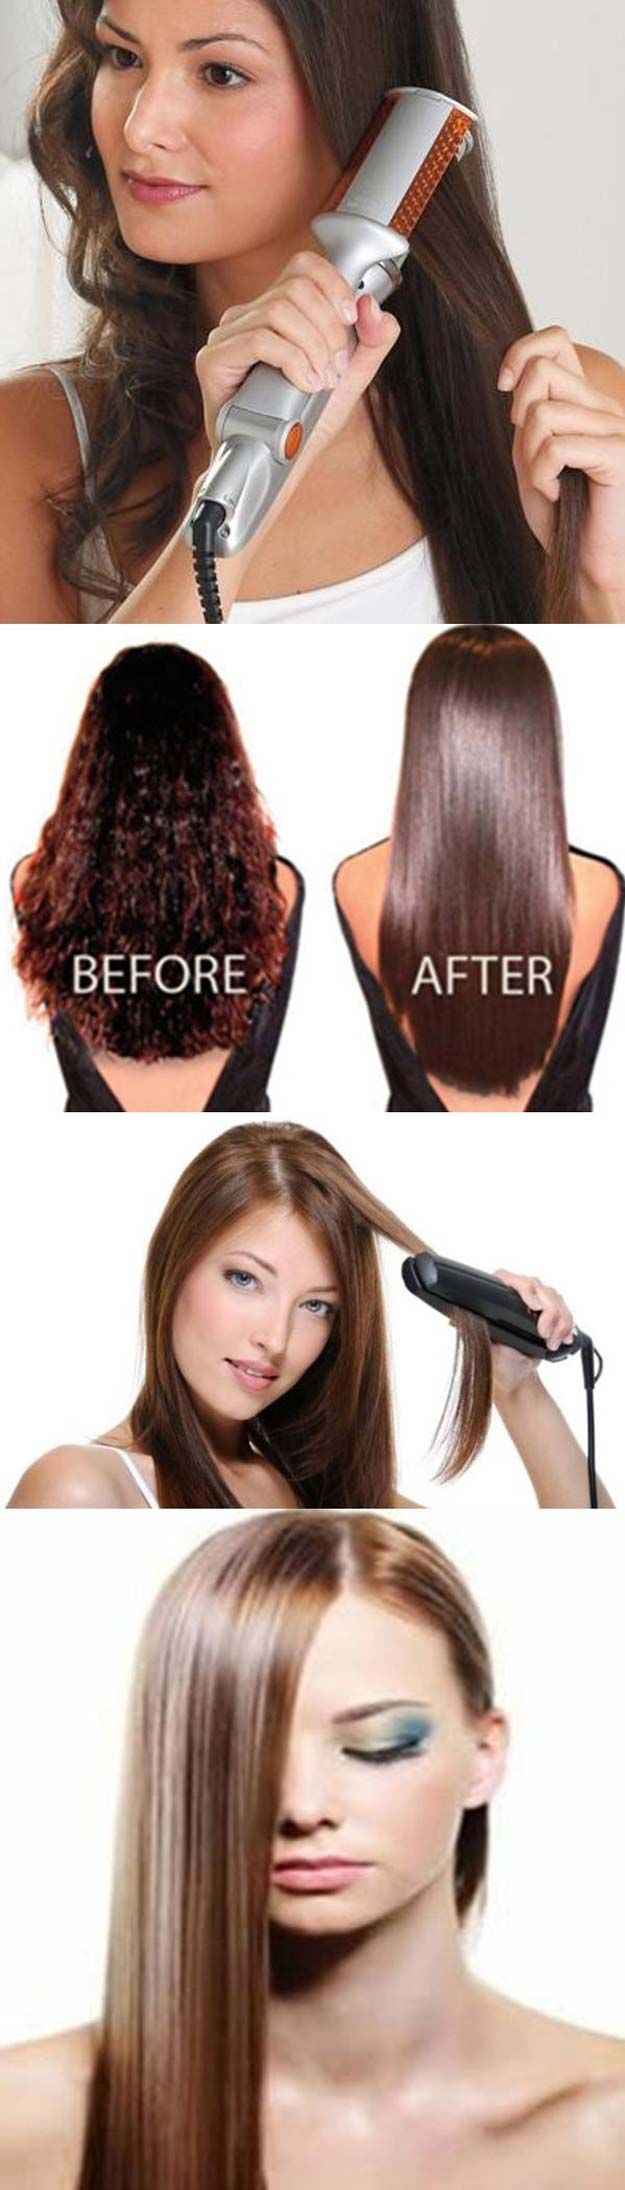 Straight perm yahoo answers - Best 25 Chemical Hair Straightening Ideas On Pinterest Hair Straightening Hair Straightener Products And Hair Straightening Treatments